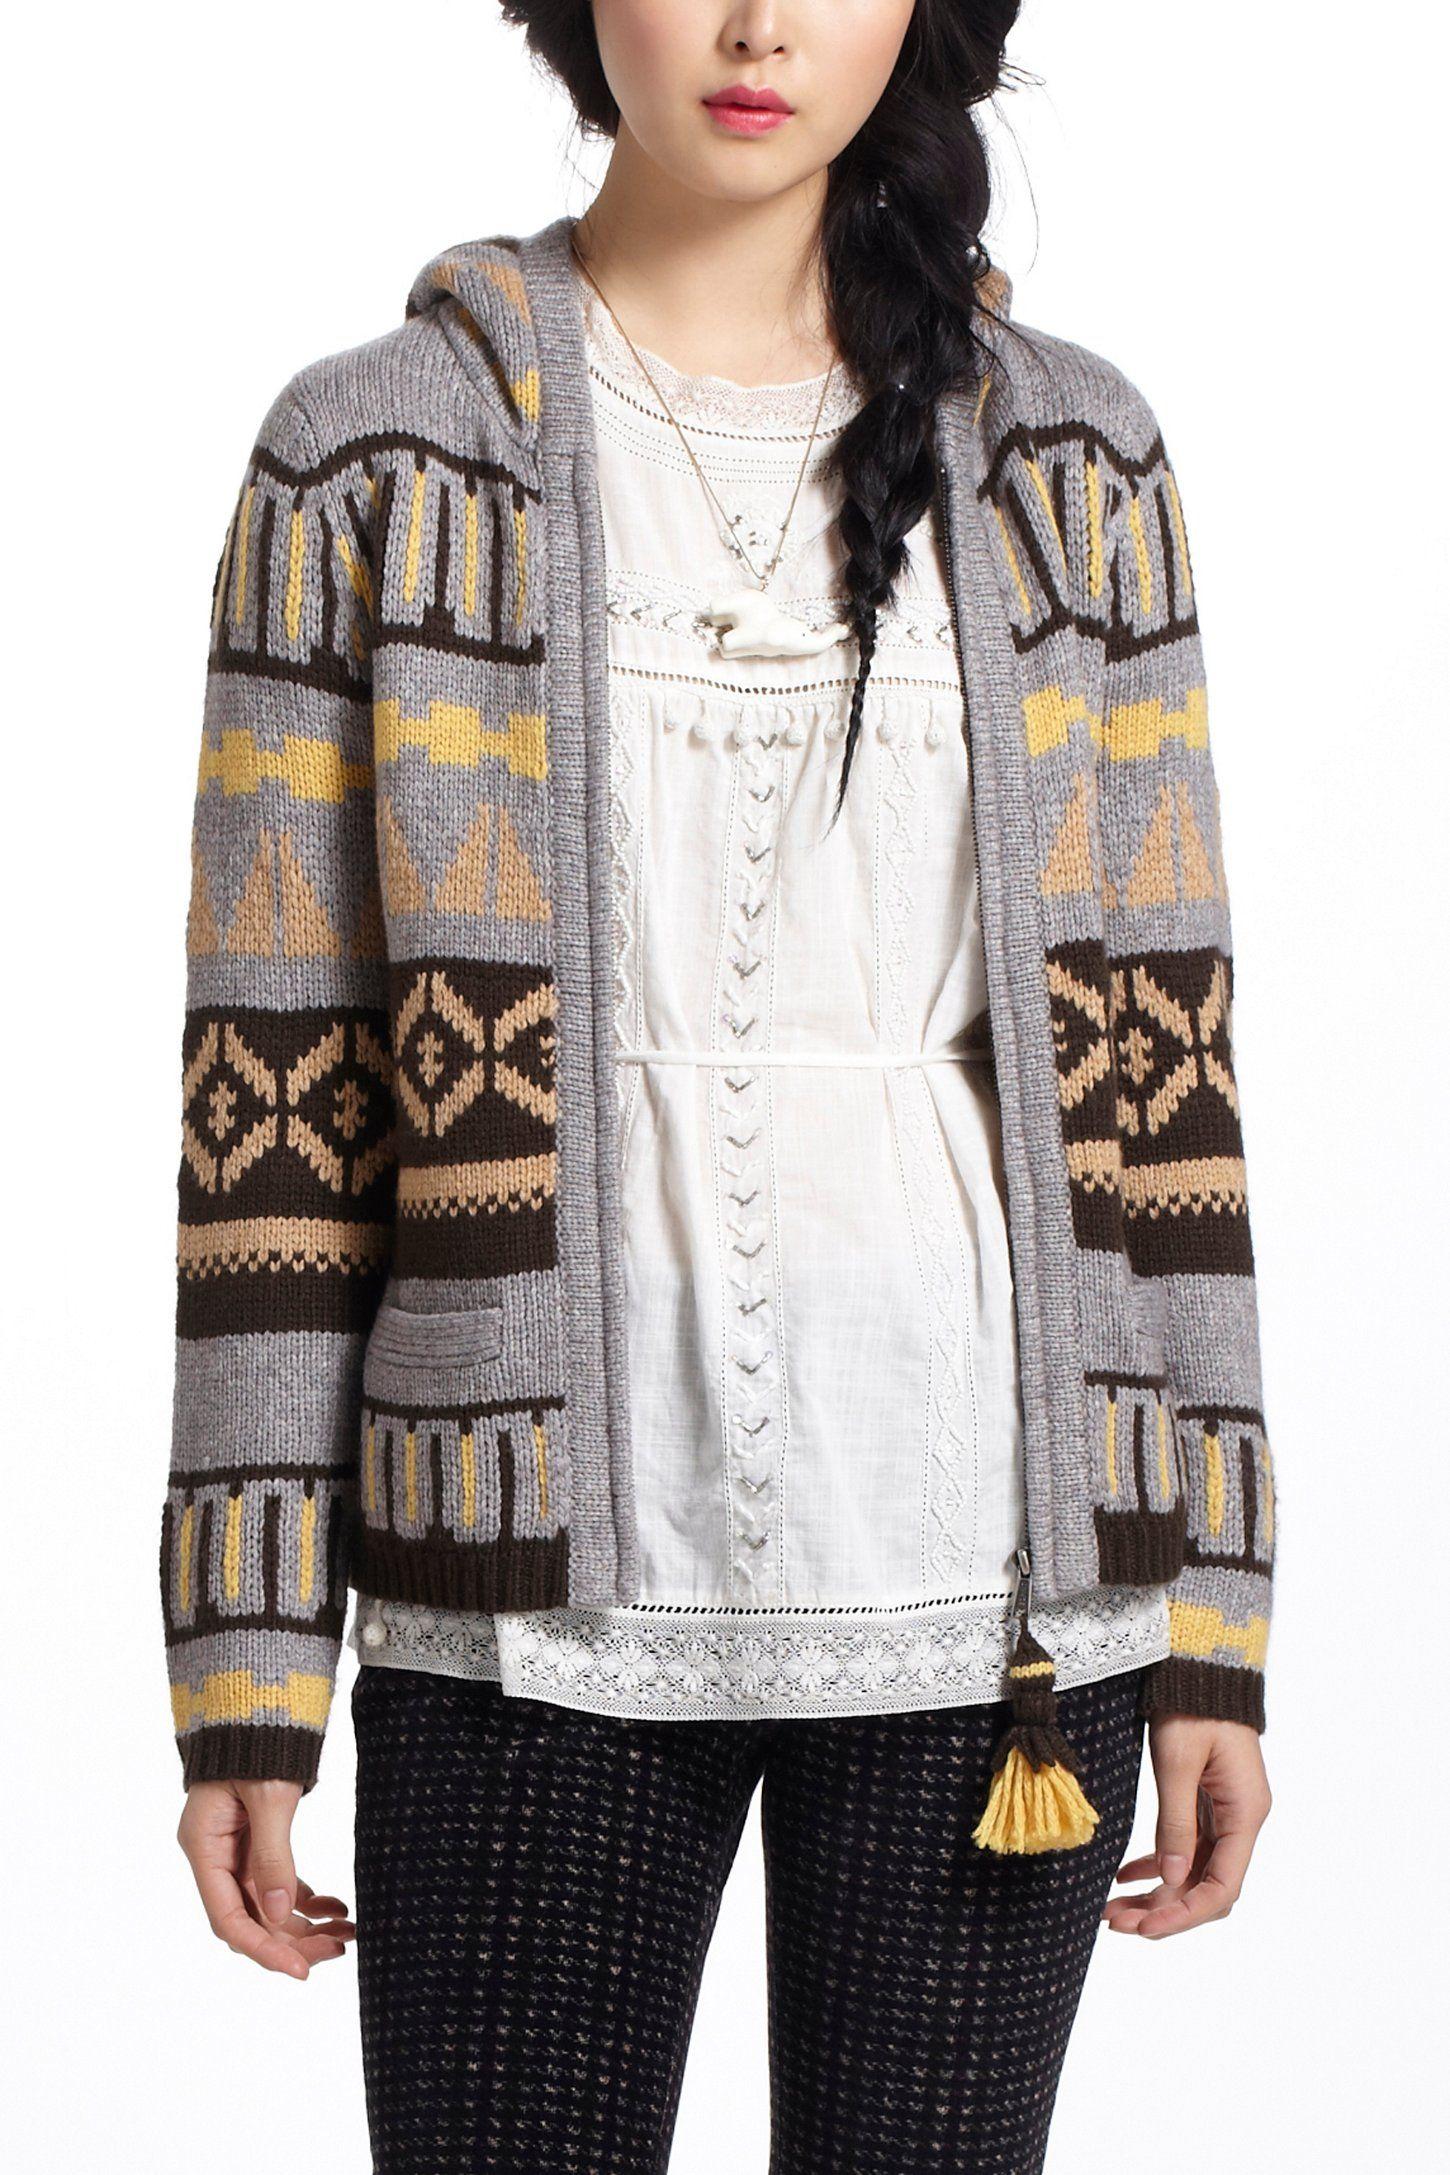 Fairisle Hooded Sweater - Anthropologie.com | Yes, please ...